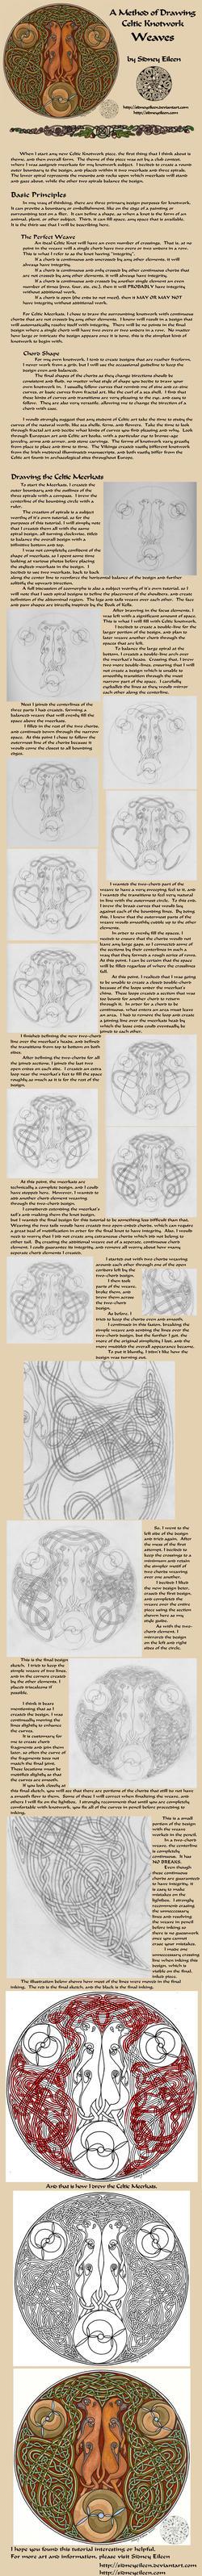 Drawing Celtic Knots - Weaves by sidneyeileen